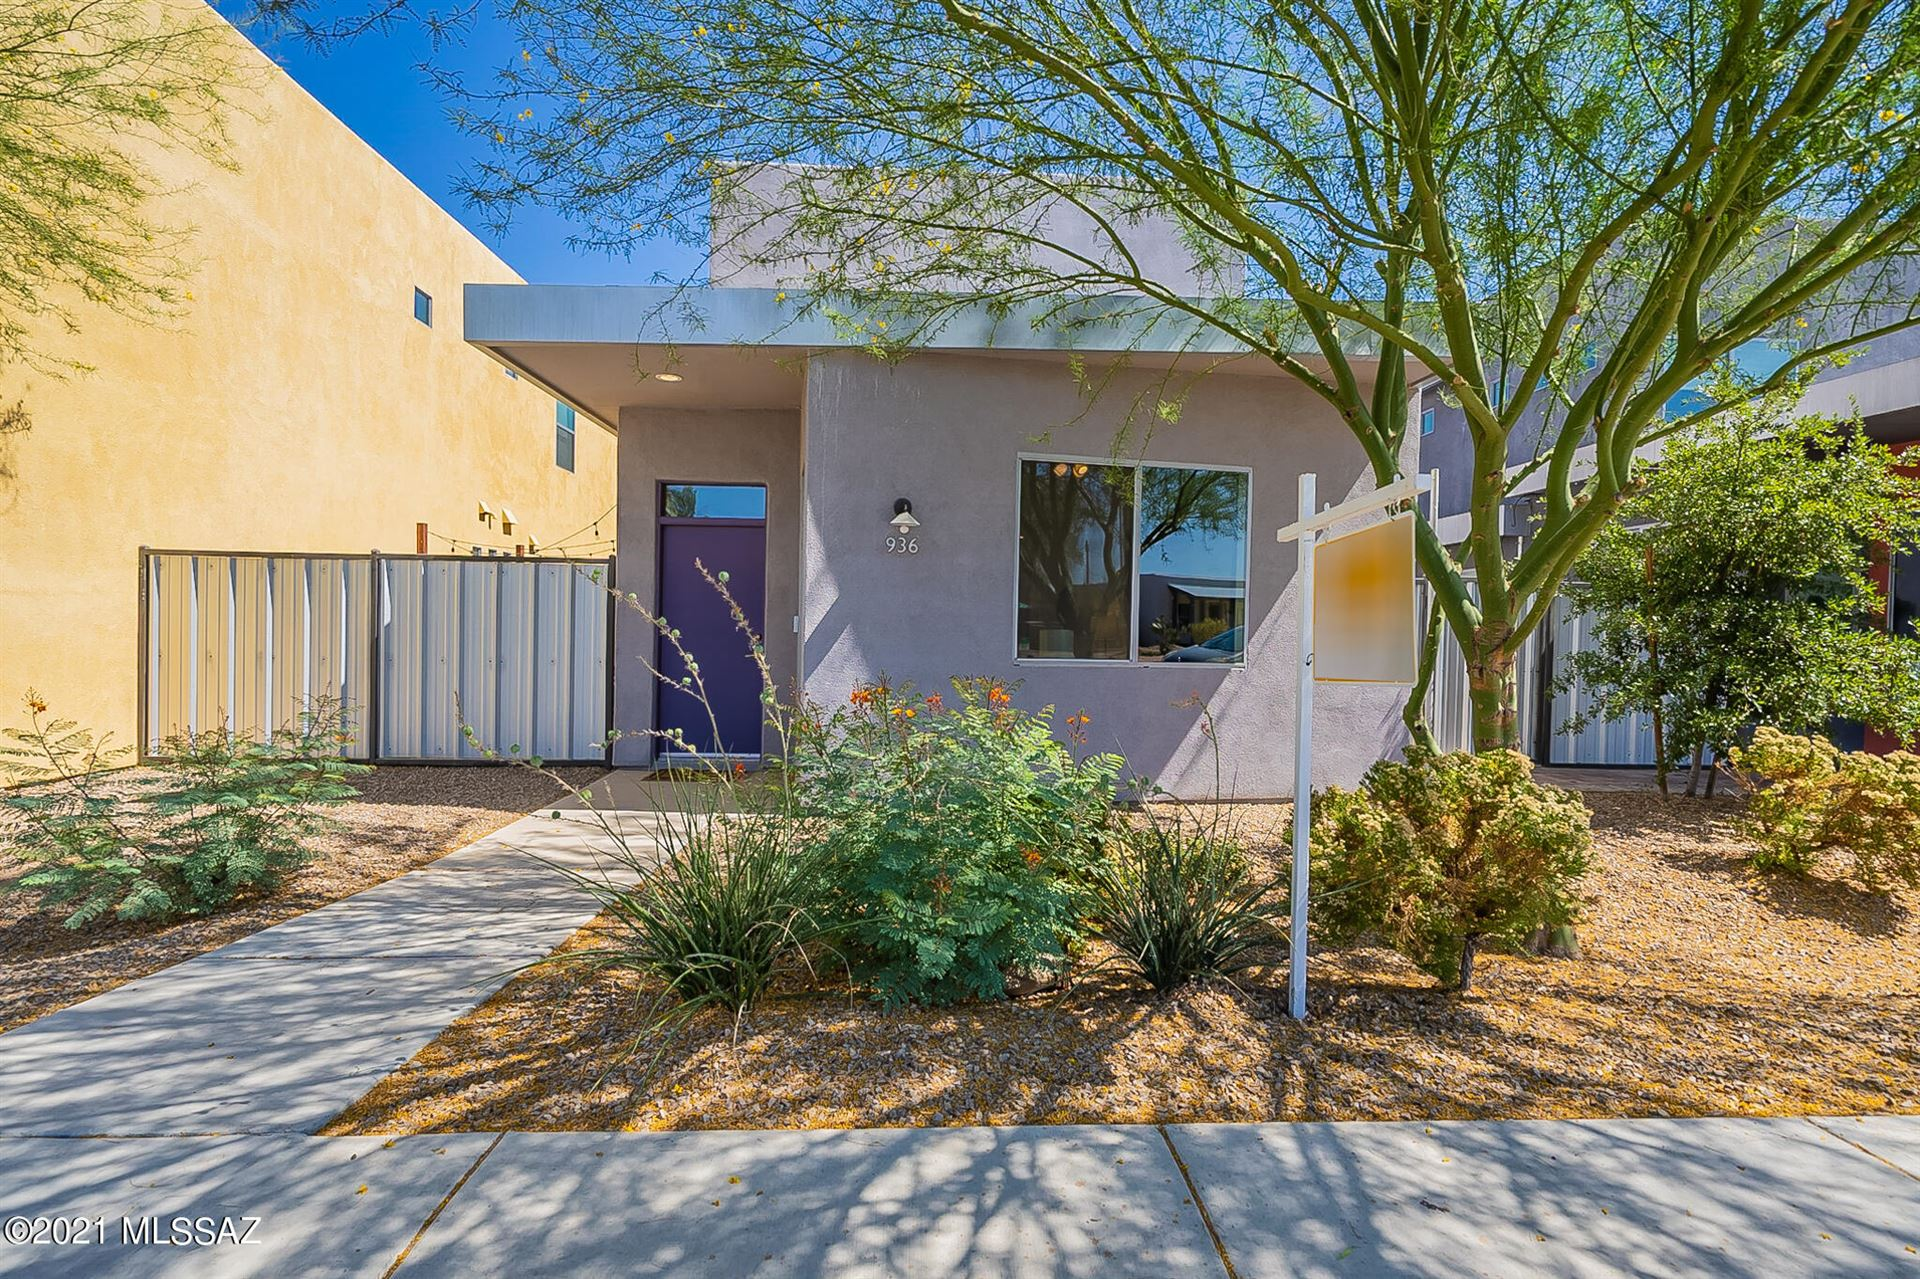 936 E Park Modern Drive, Tucson, AZ 85719 - MLS#: 22115601